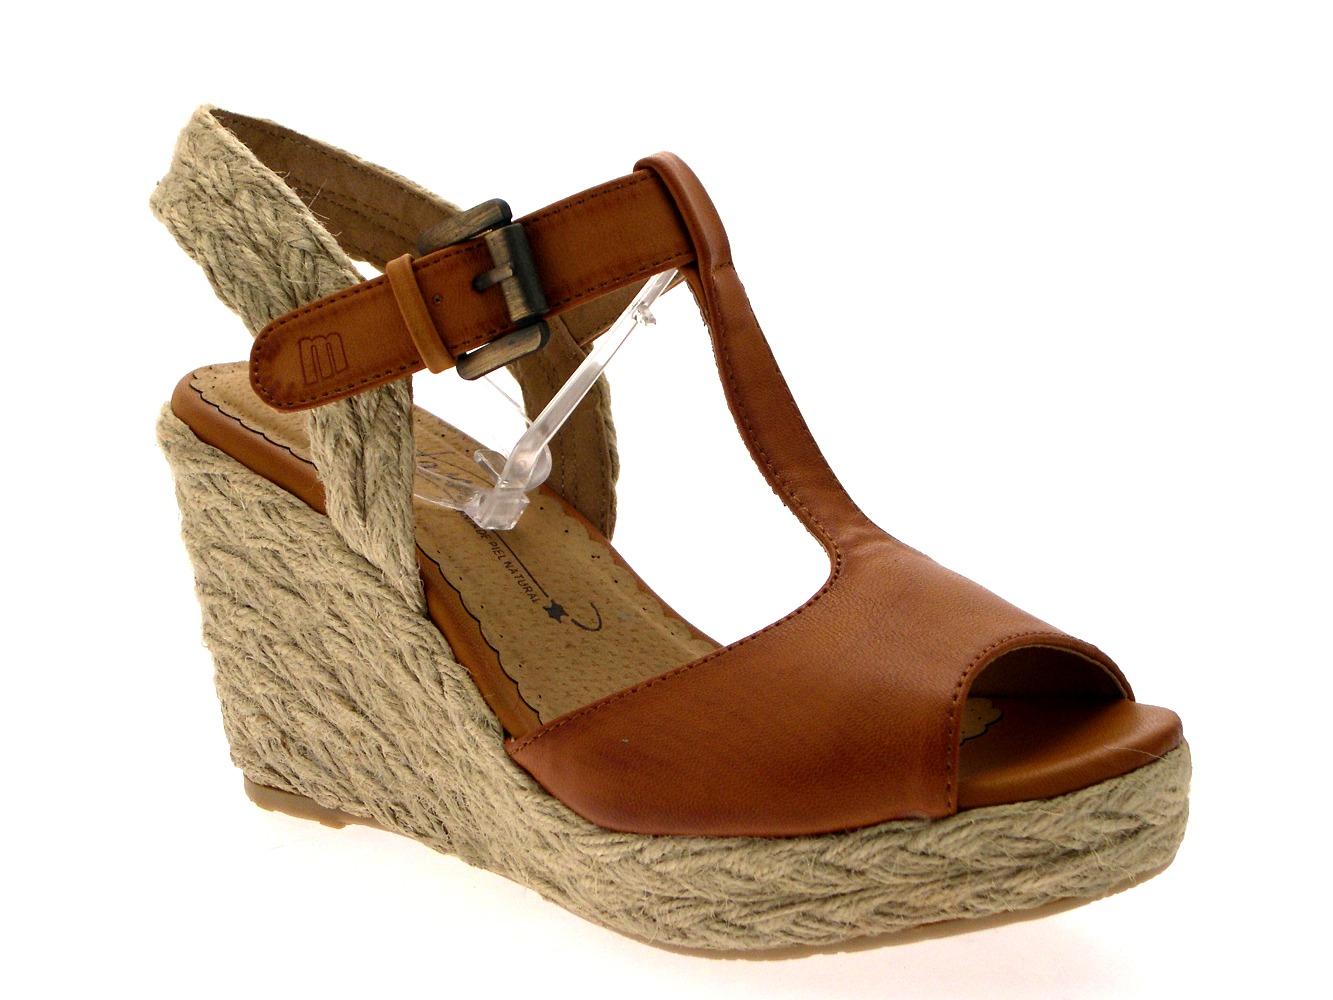 Original Sandals 2016 Rope Heels Women Platform Sandals Gladiator Summer Shoes